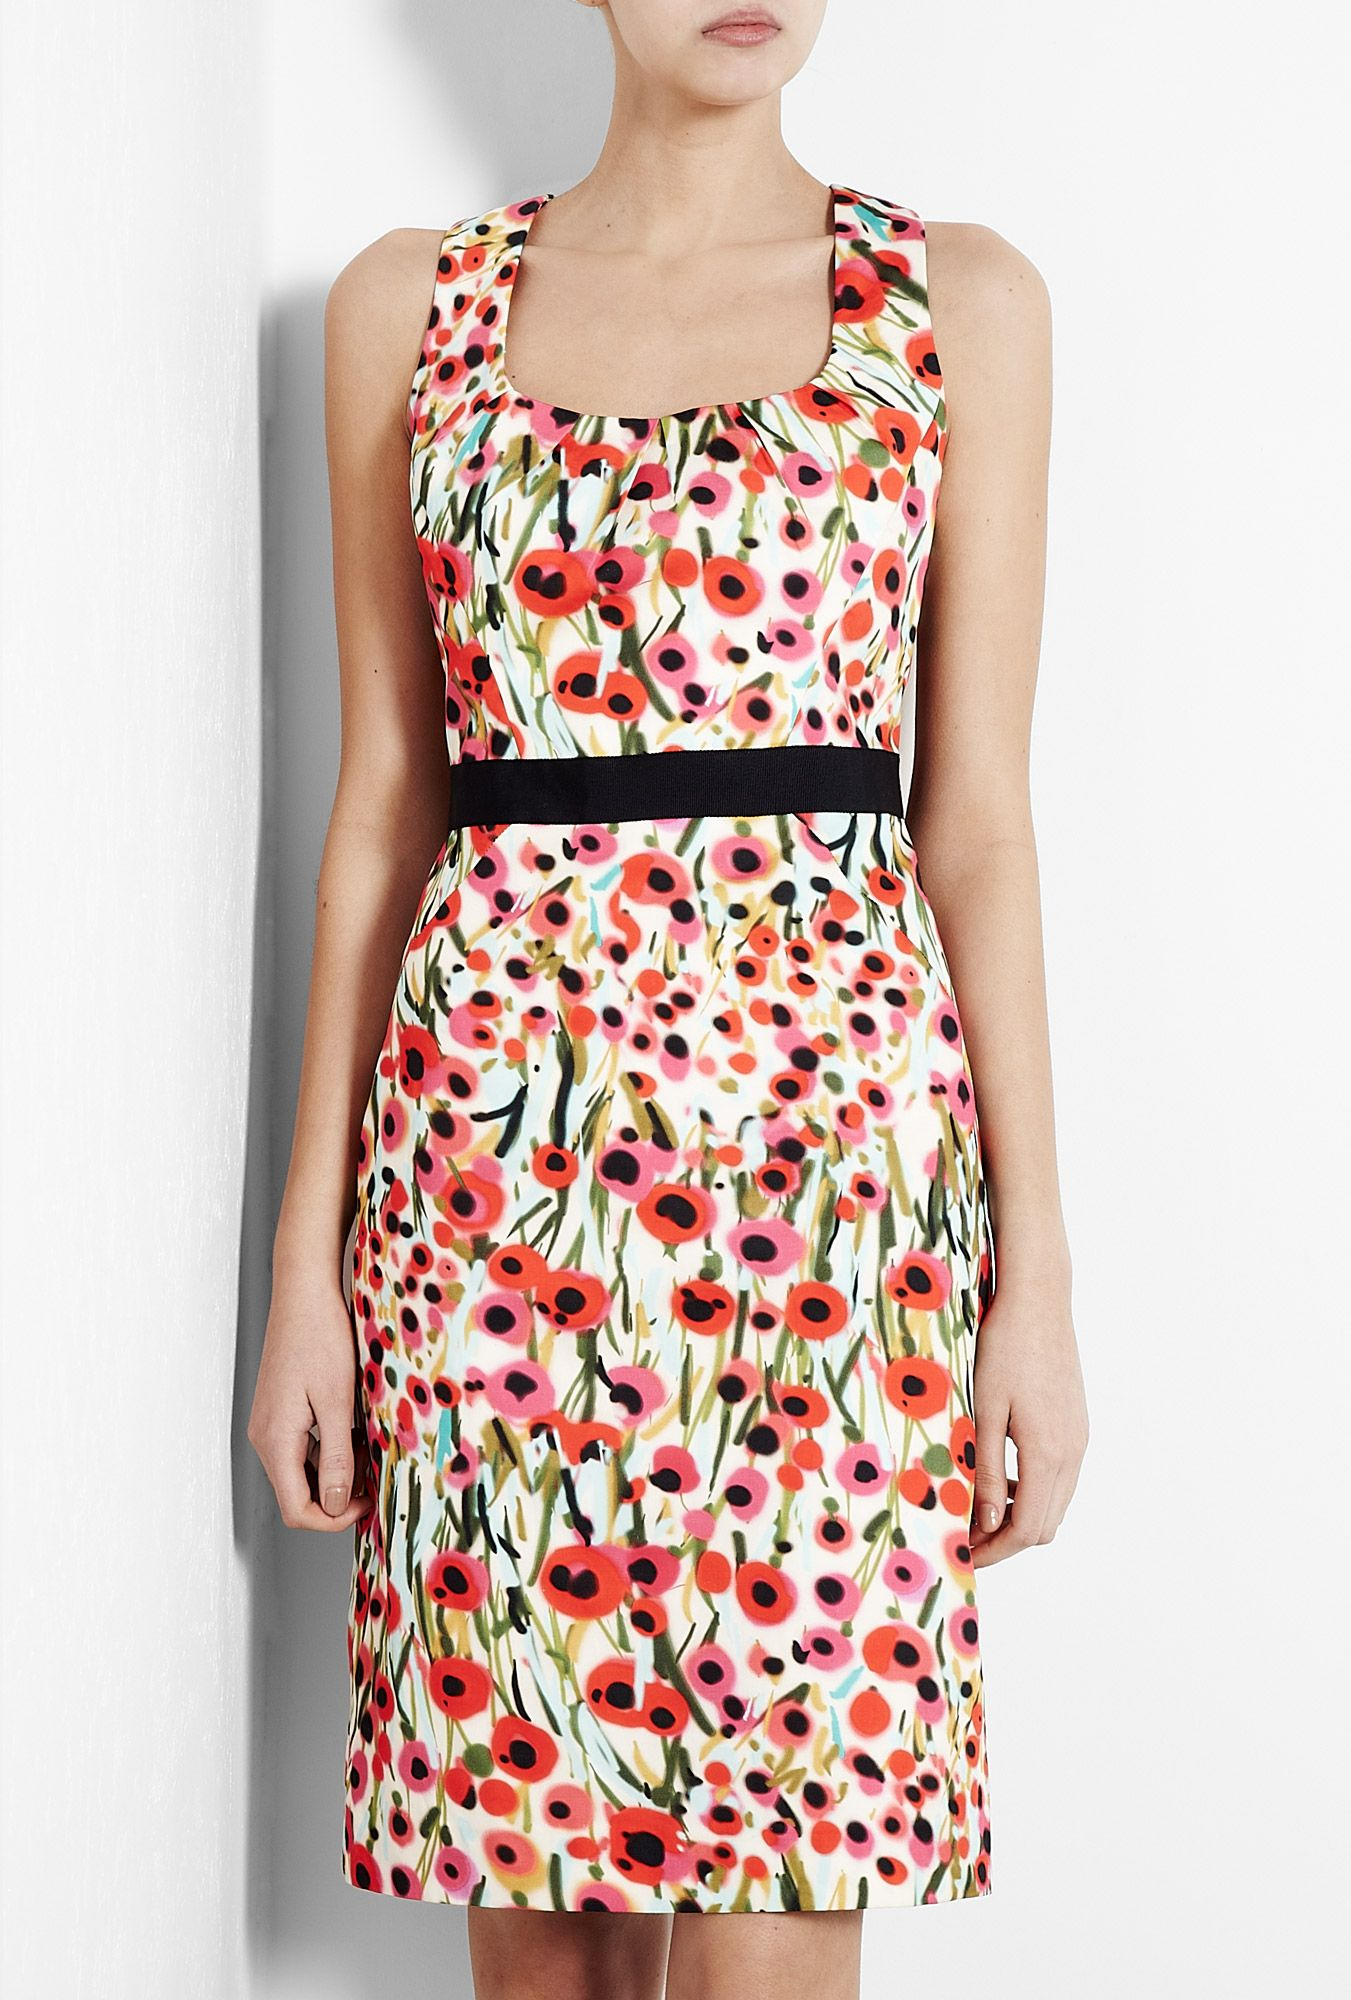 Poppy Field Print Sheath Dress By Milly Red Dress Short Dresses Printed Sheath Dresses [ 2000 x 1351 Pixel ]